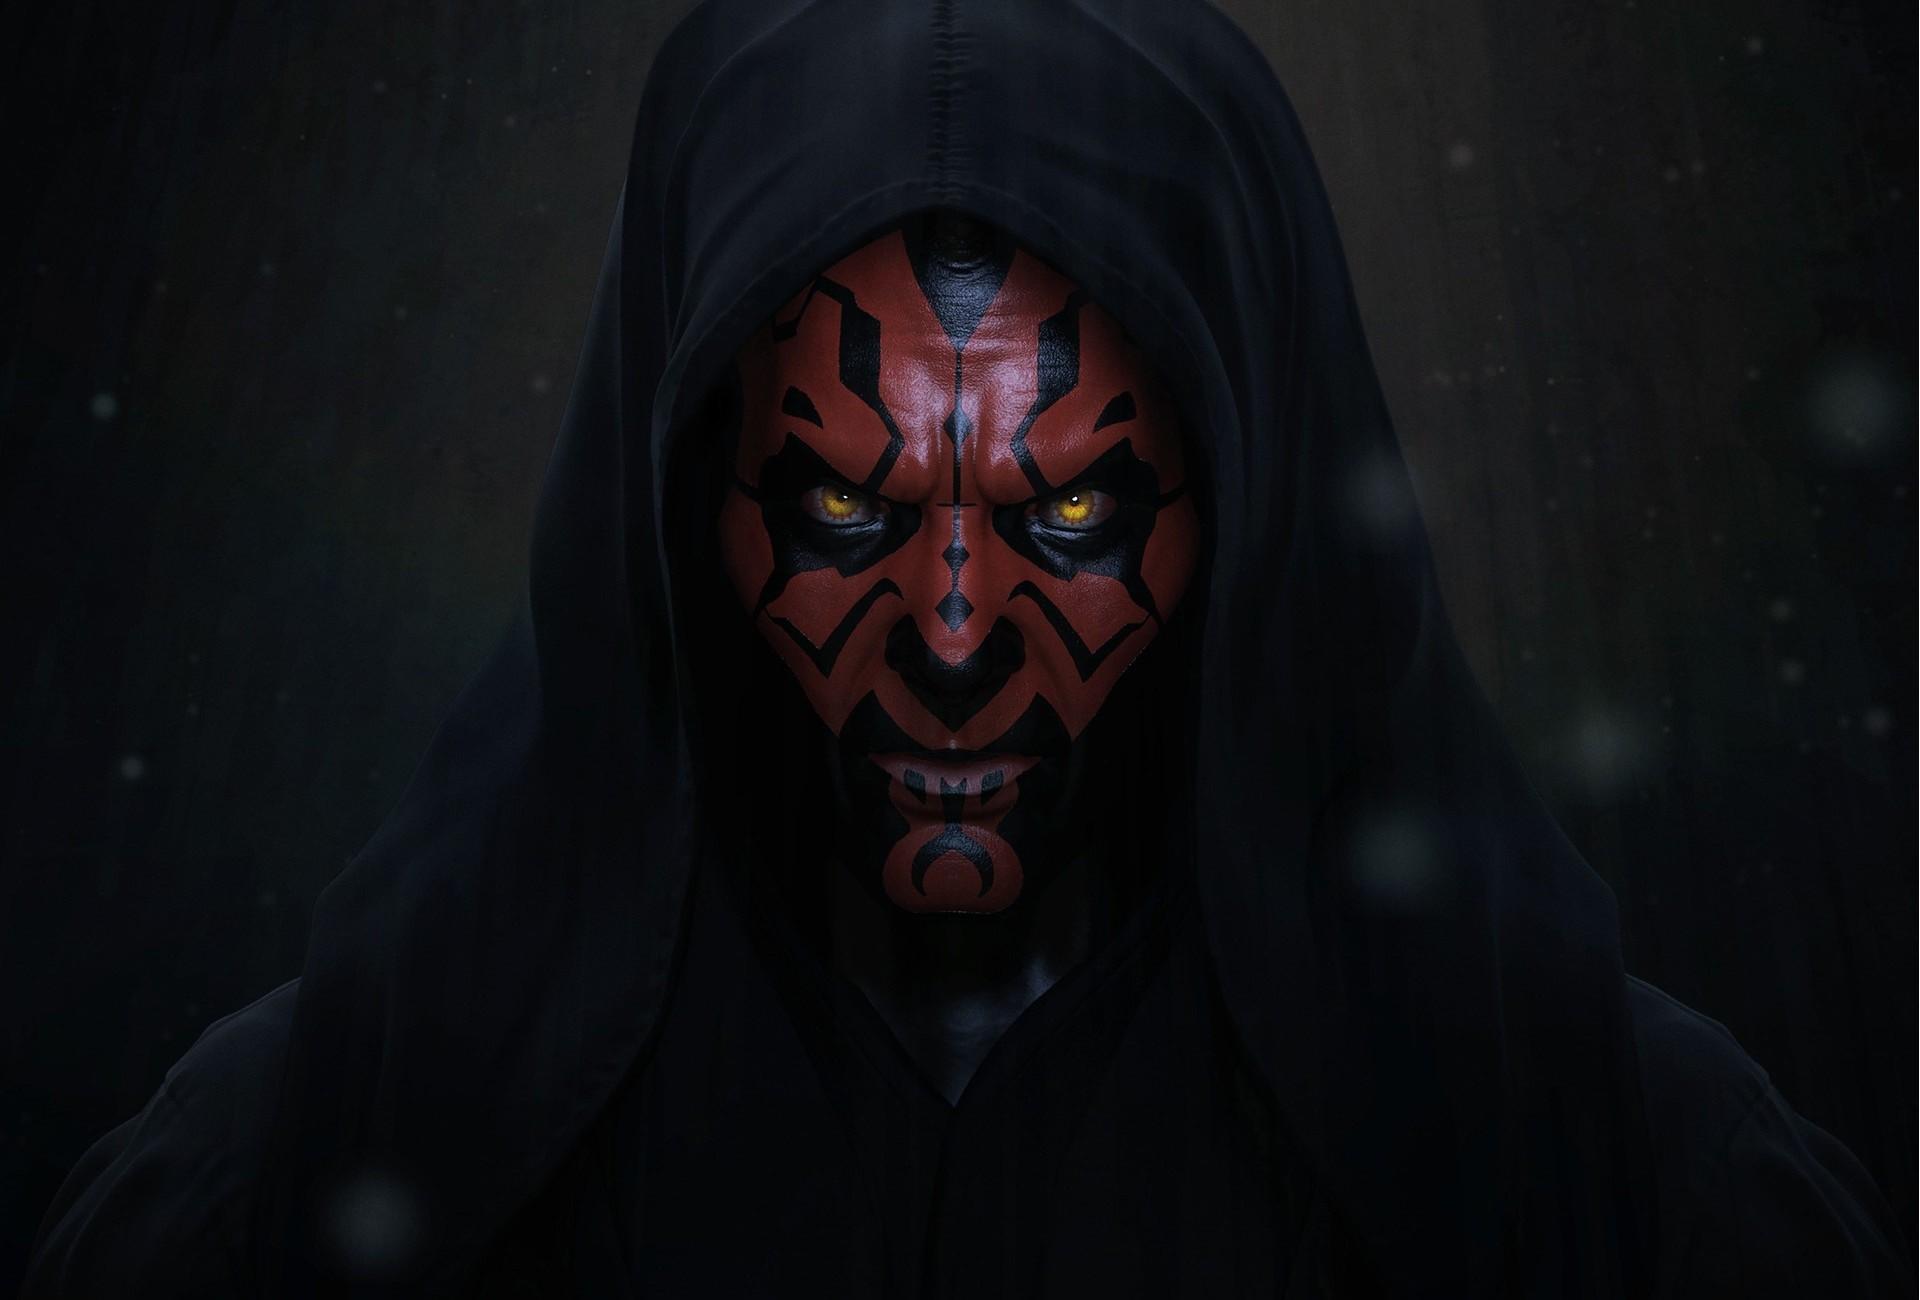 General 1920x1300 Sith Darth Maul Star Wars artwork Star Wars Villains